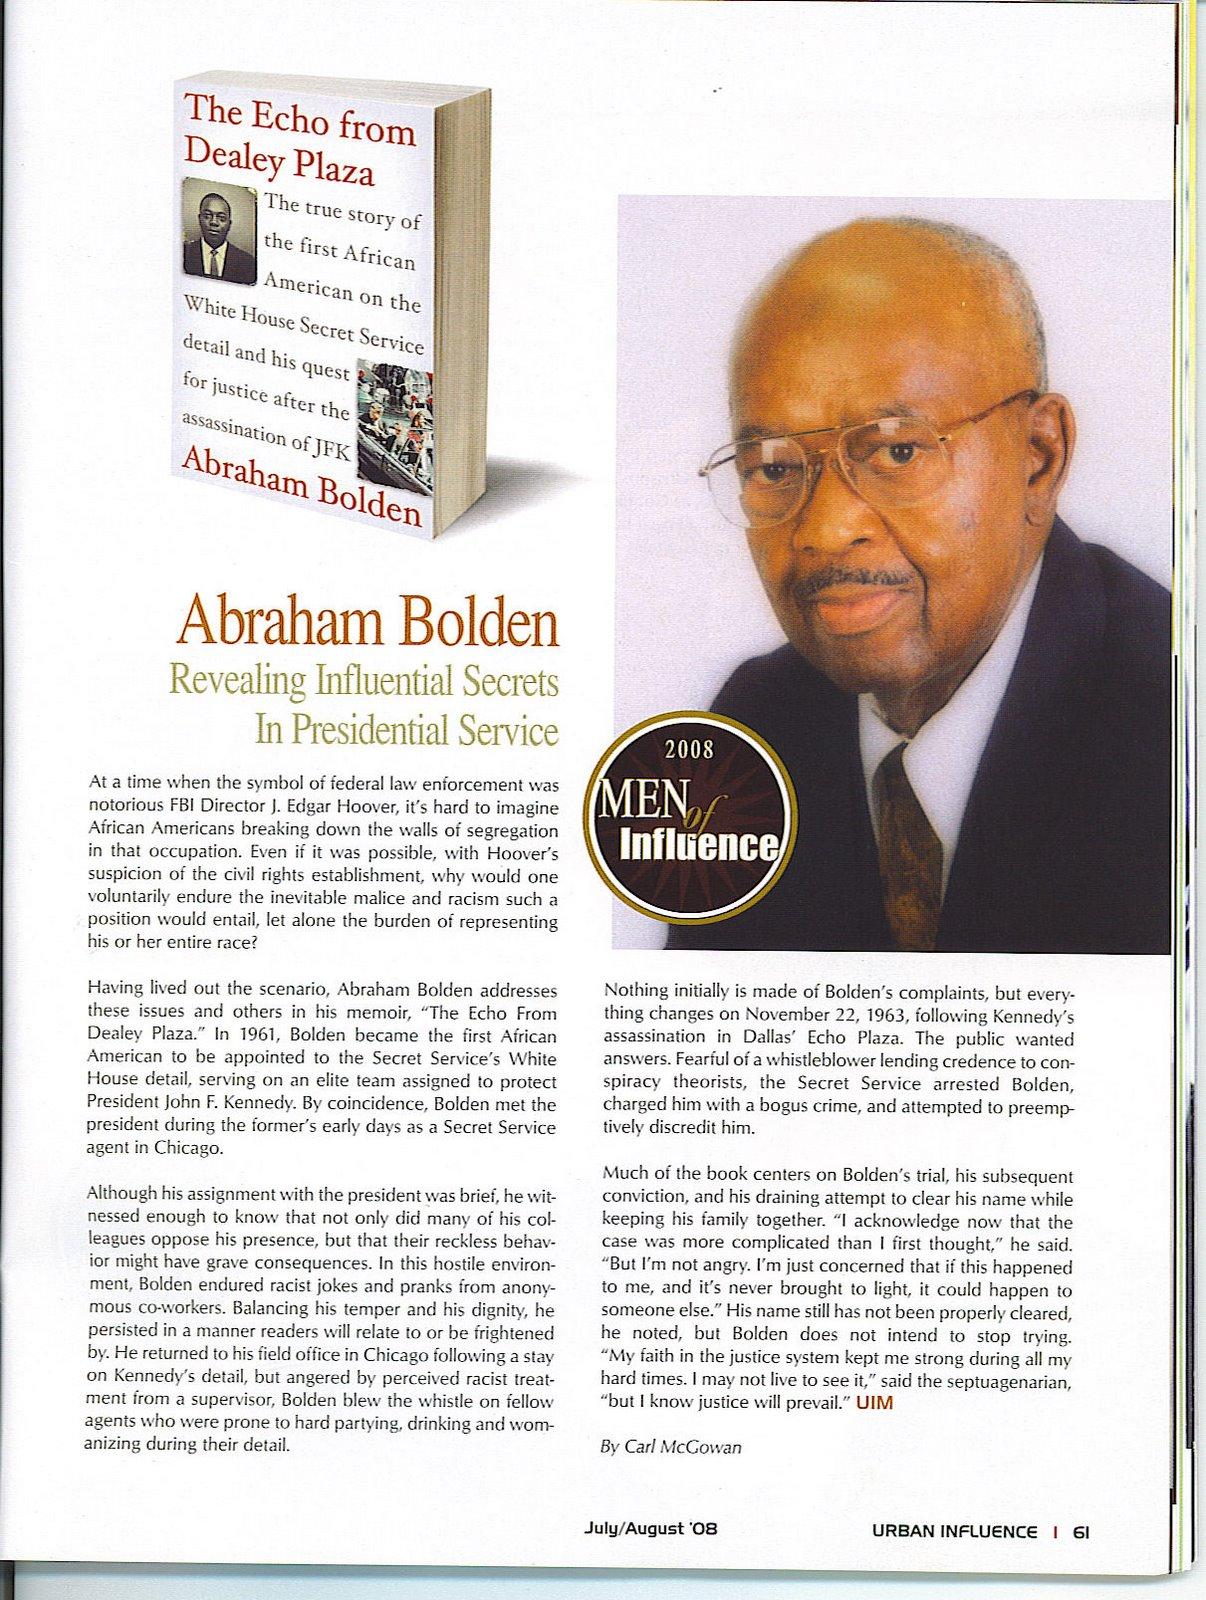 ABRAHAM BOLDEN